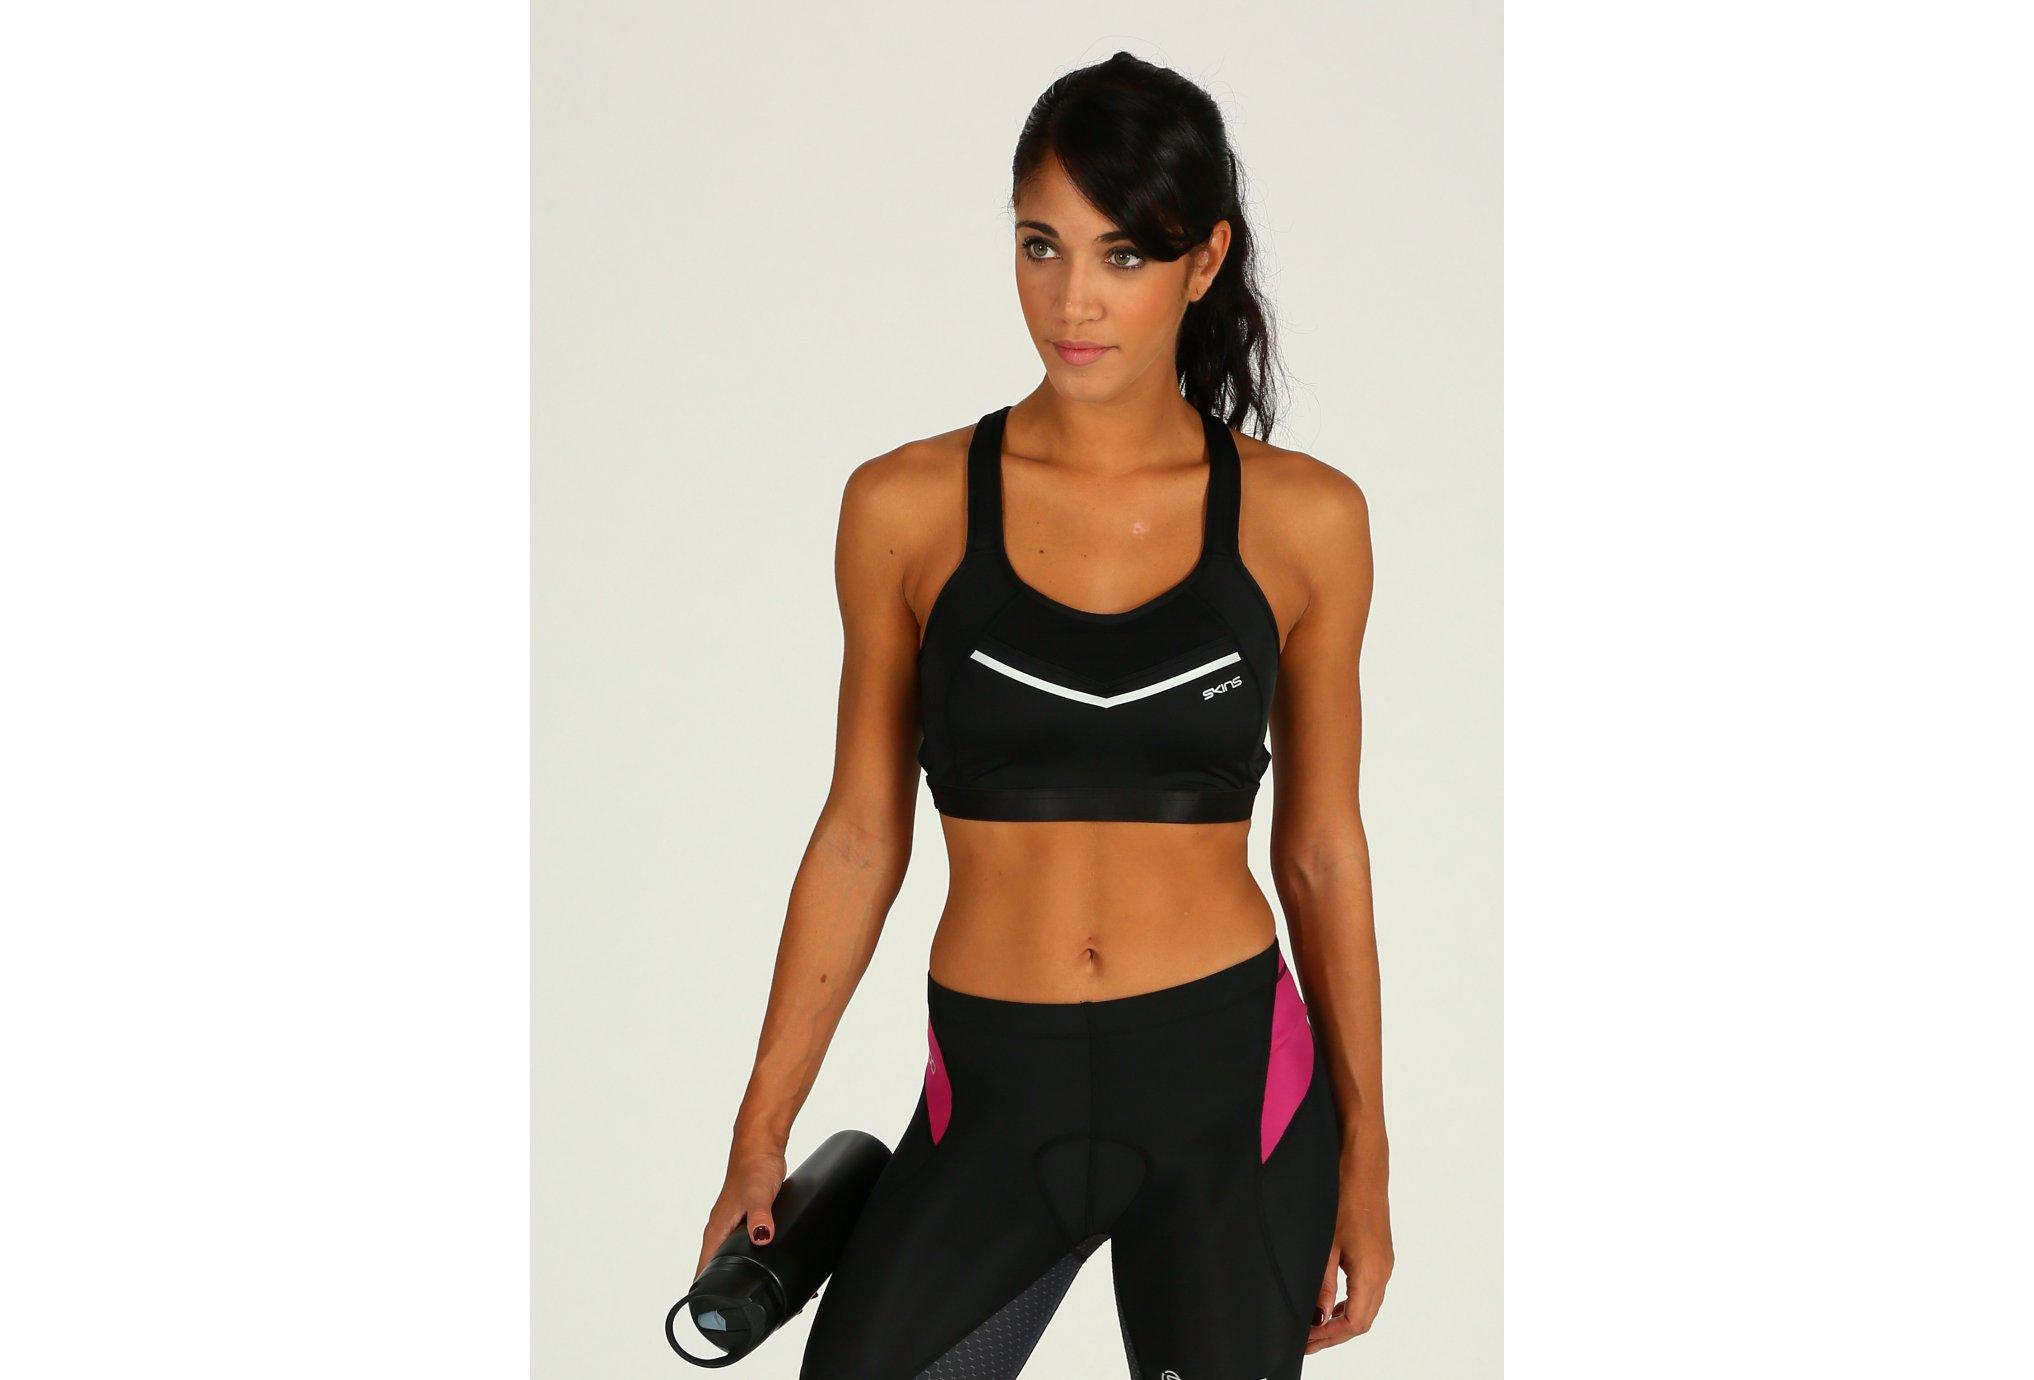 Skins DNAmic High Impact vêtement running femme